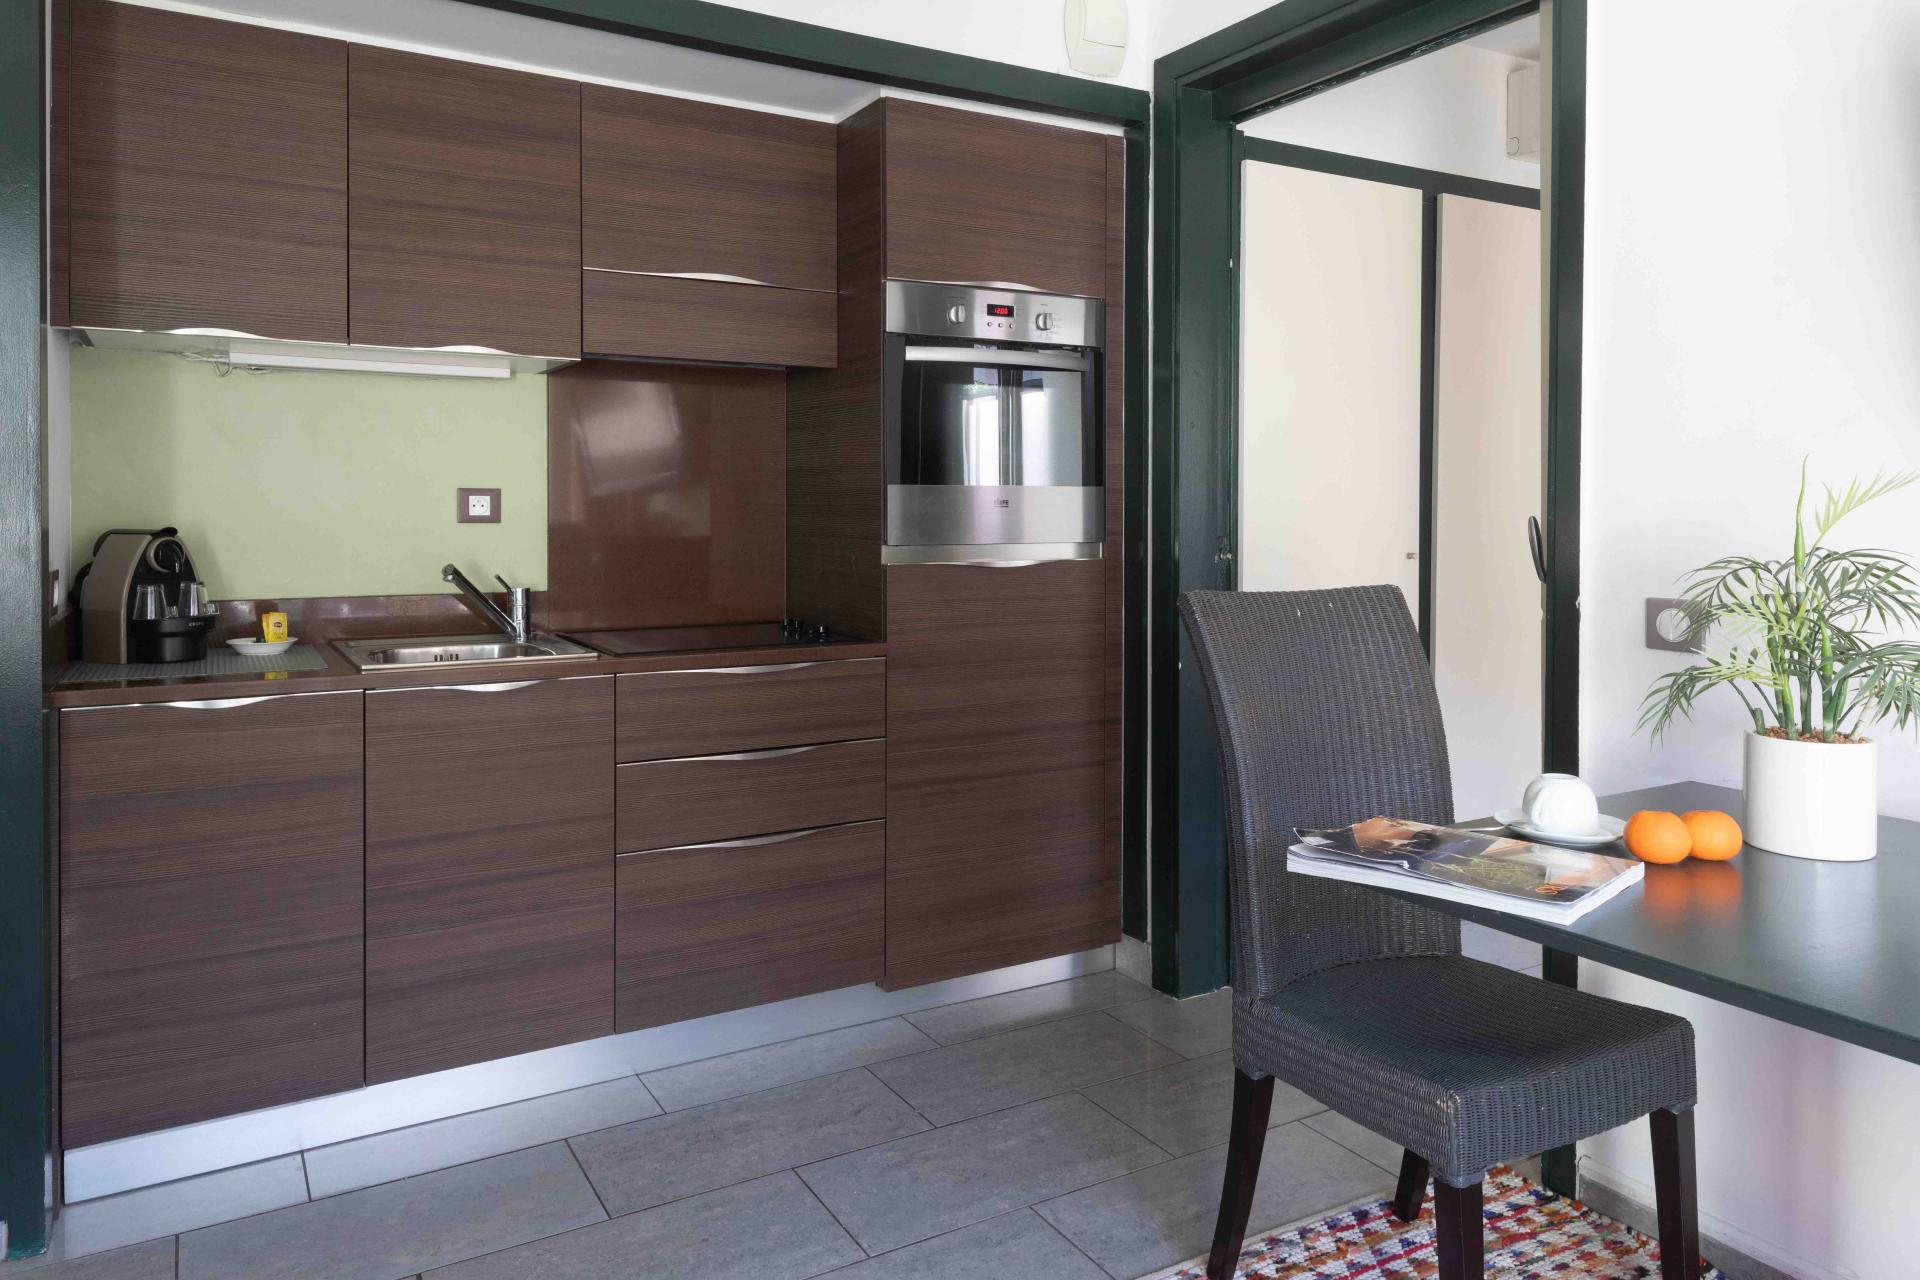 Kitchen area at Avenue Alexandre Apartments, Juan-les-Pins, Antibes